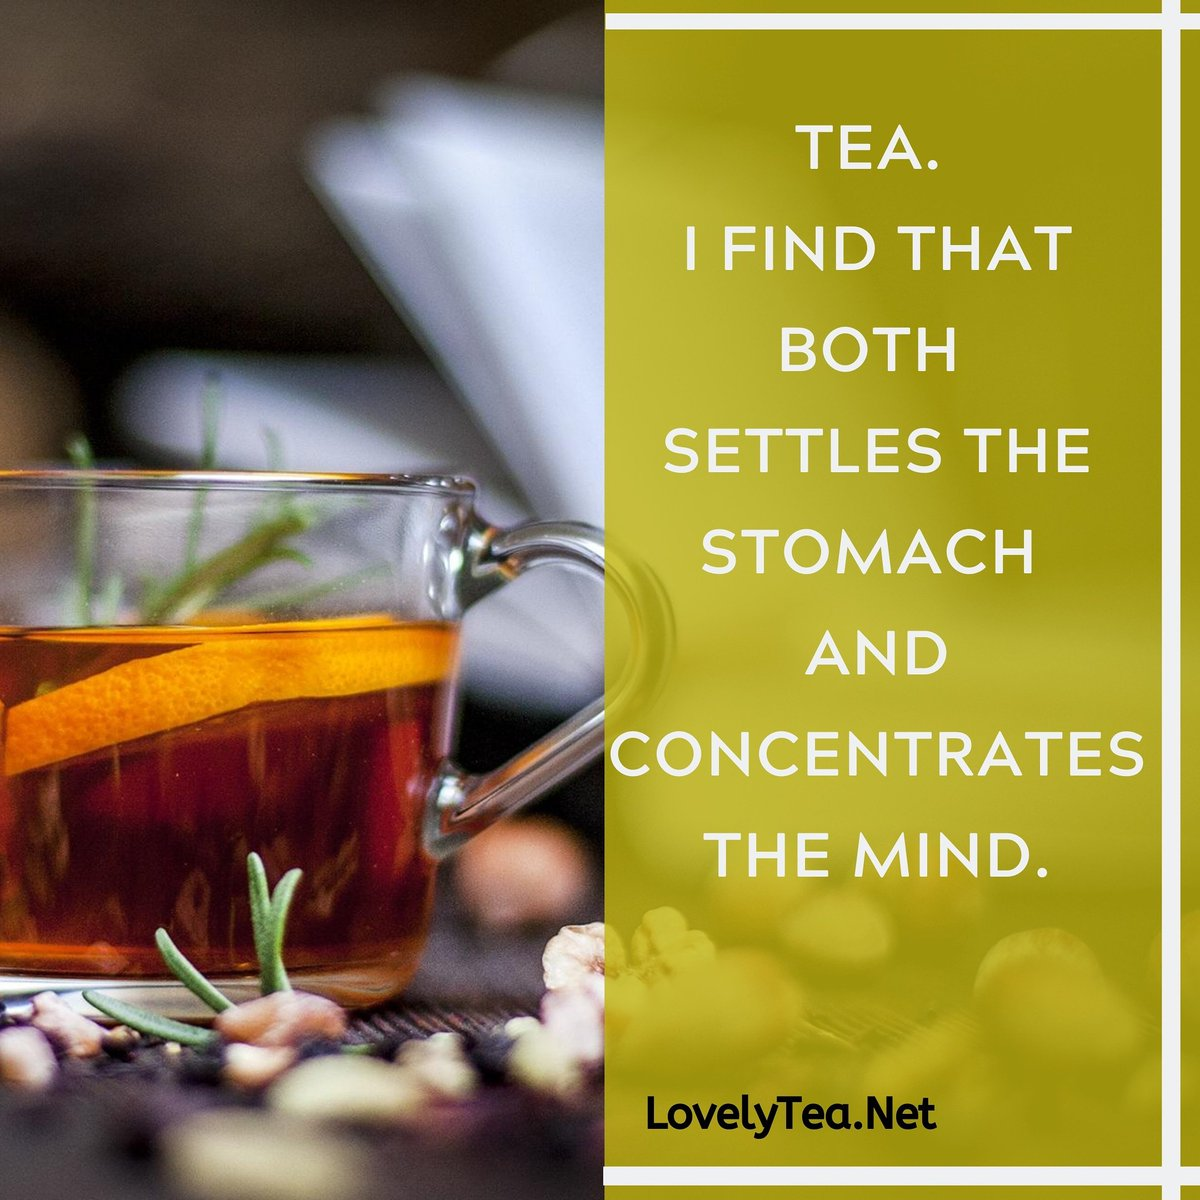 #supportsmallbusiness#motivate #didyouknowfacts #teaholic  #lovelytea #tealovers#matcha #j#ilovetea #teagram #lovelytea___ #healthy #love #lovelyti2002 #teaandseasons #organic #instagood #morningtea #today  #maydiaries #thoughts  #motivationalquotes #lovelyteapic.twitter.com/ym8blycrvT